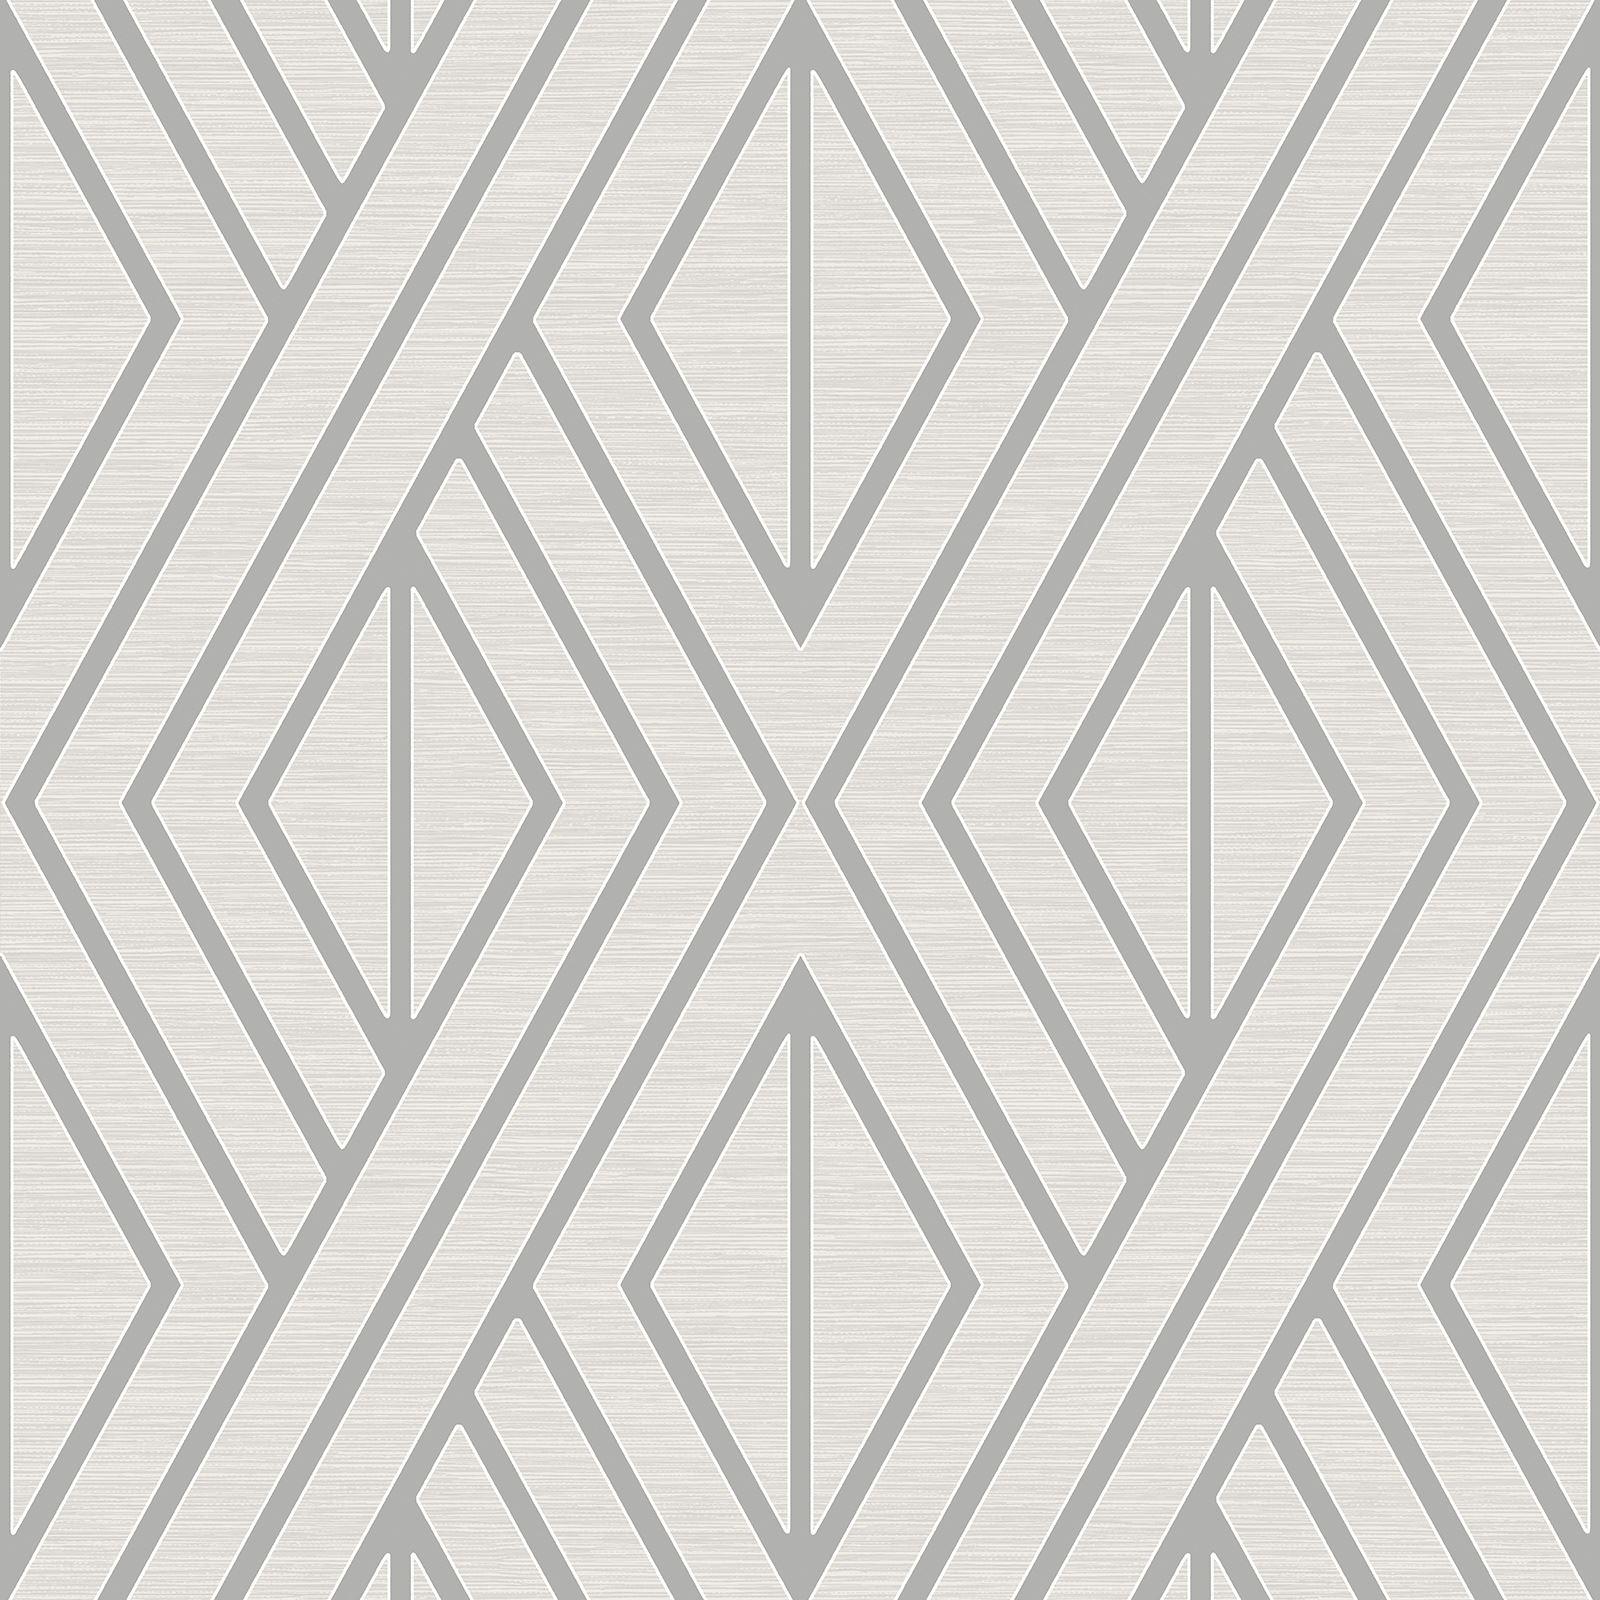 miniatura 65 - Carta da Parati Geometrica Arredamento Camera Moderno Vari Disegni e Colori